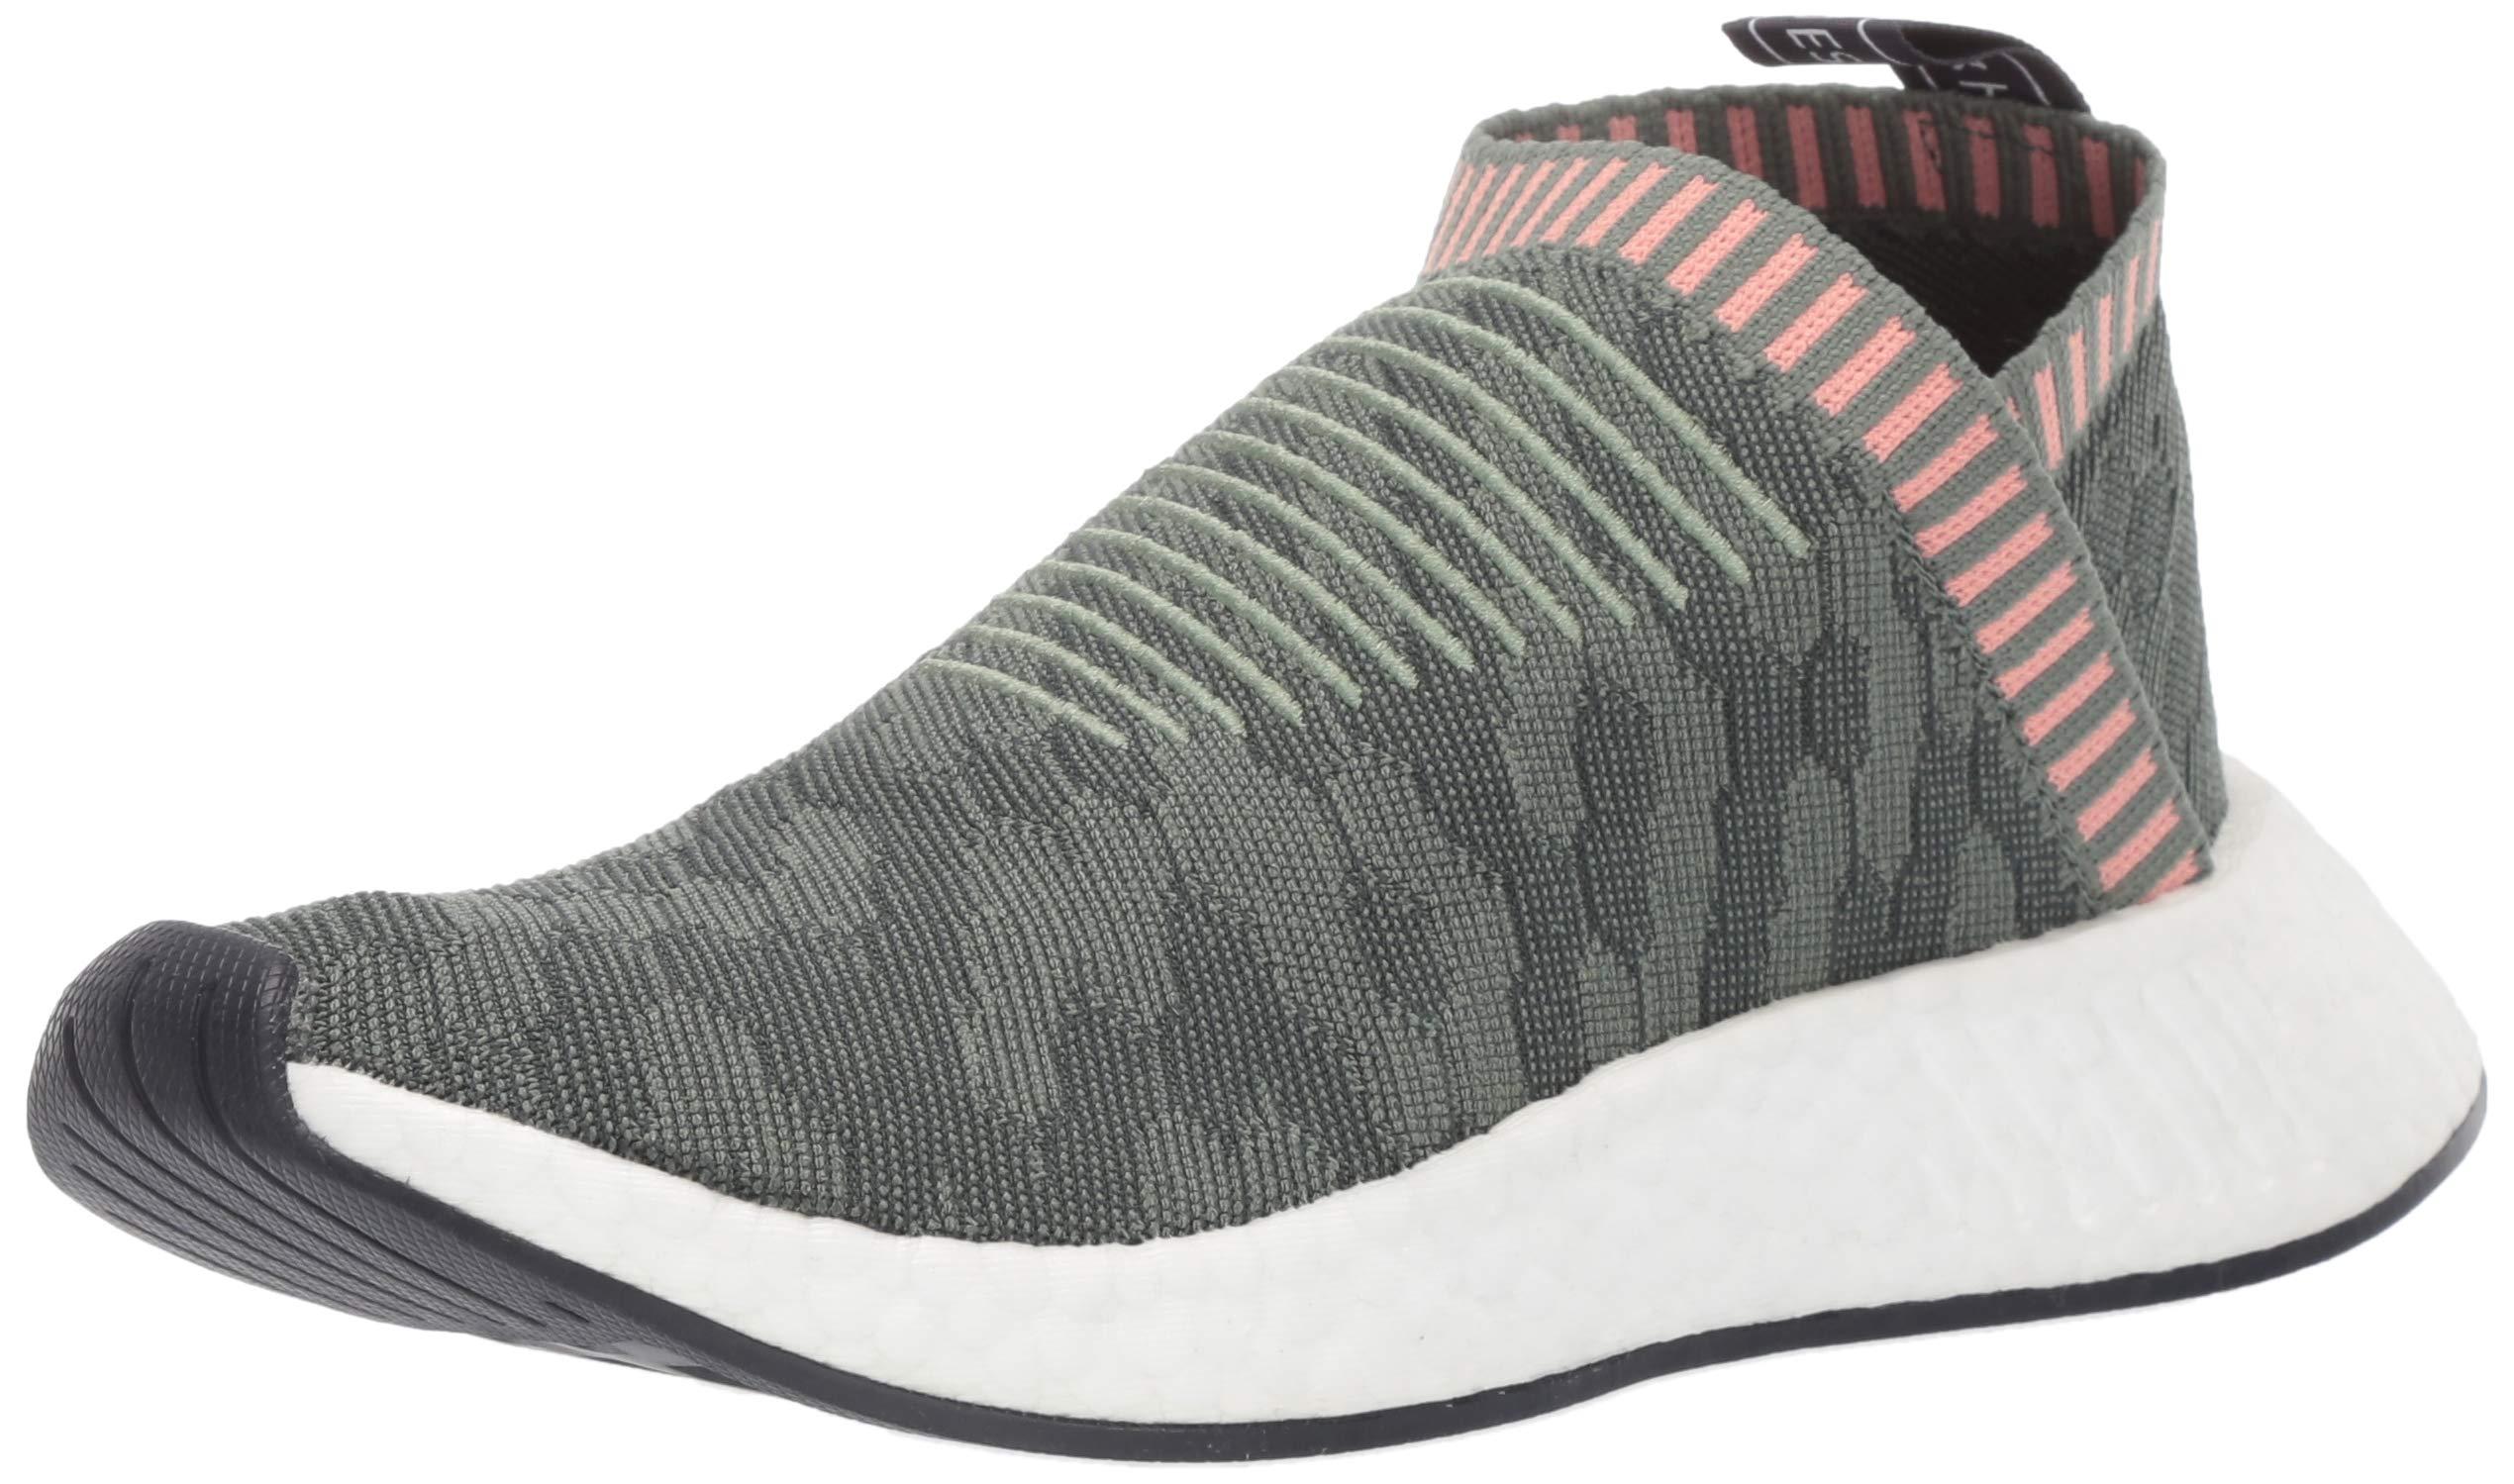 ShoeGreentrace Women's Nmd Originals Us Adidas cs2 5 Pink6 M Pk W Running 3S4jLcq5AR